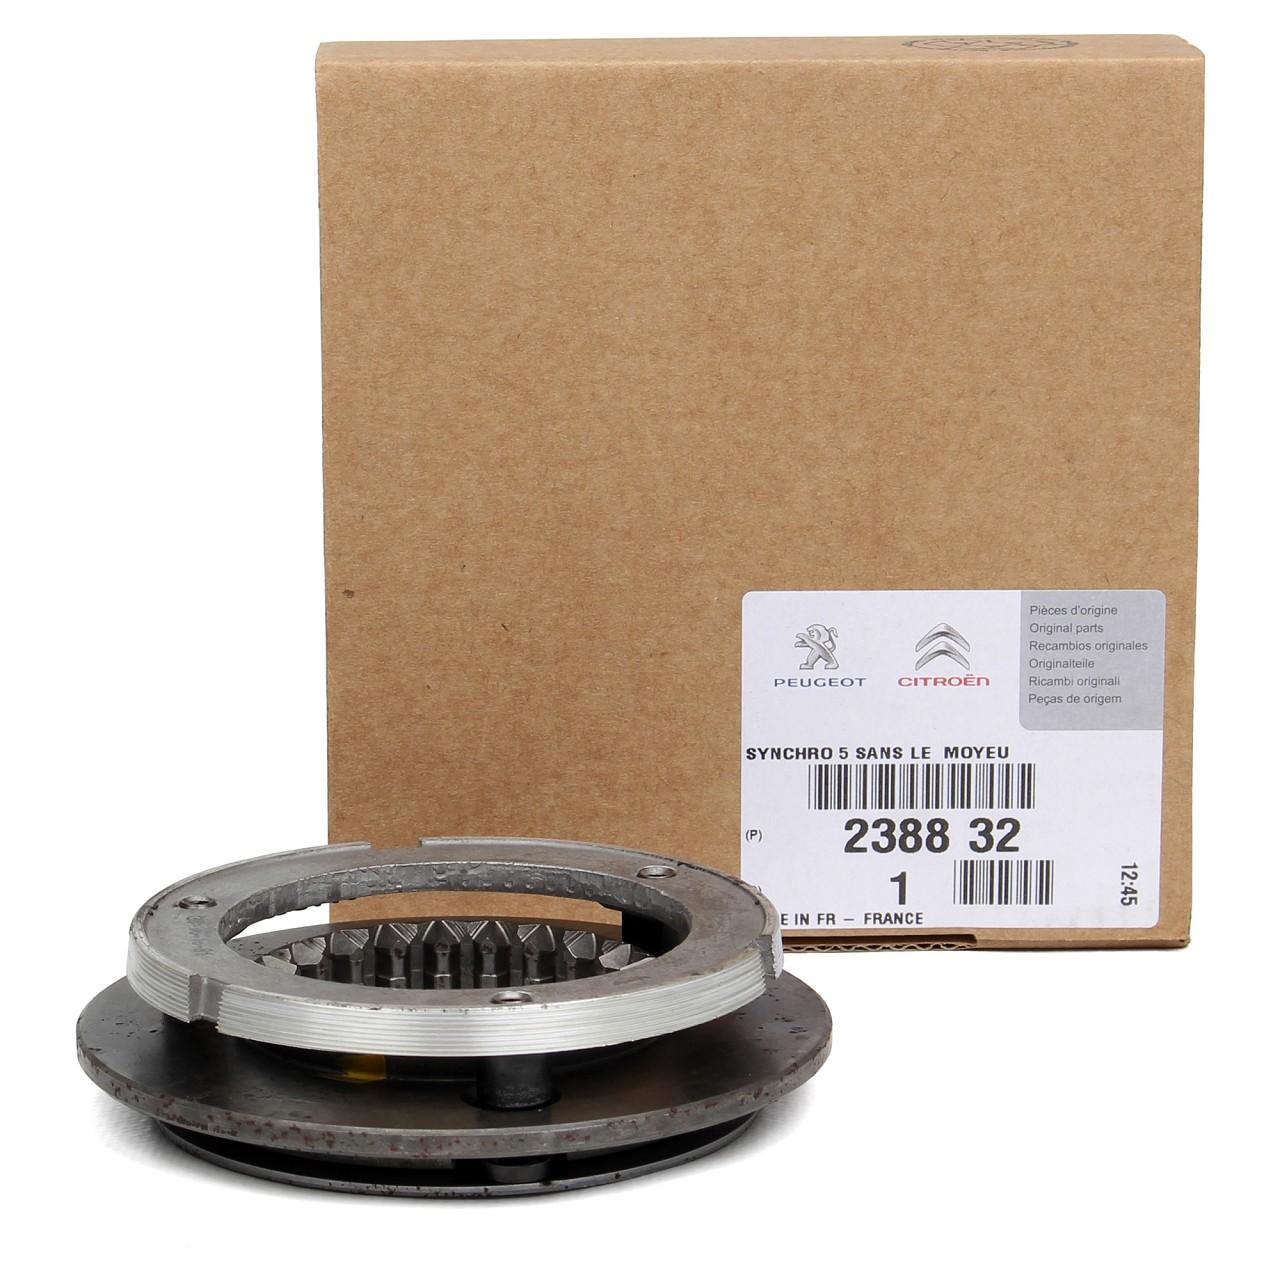 ORIGINAL Citroen Peugeot Synchronring Schaltgetriebe Berlingo DS3 DS4 207 208 C4 2388.32